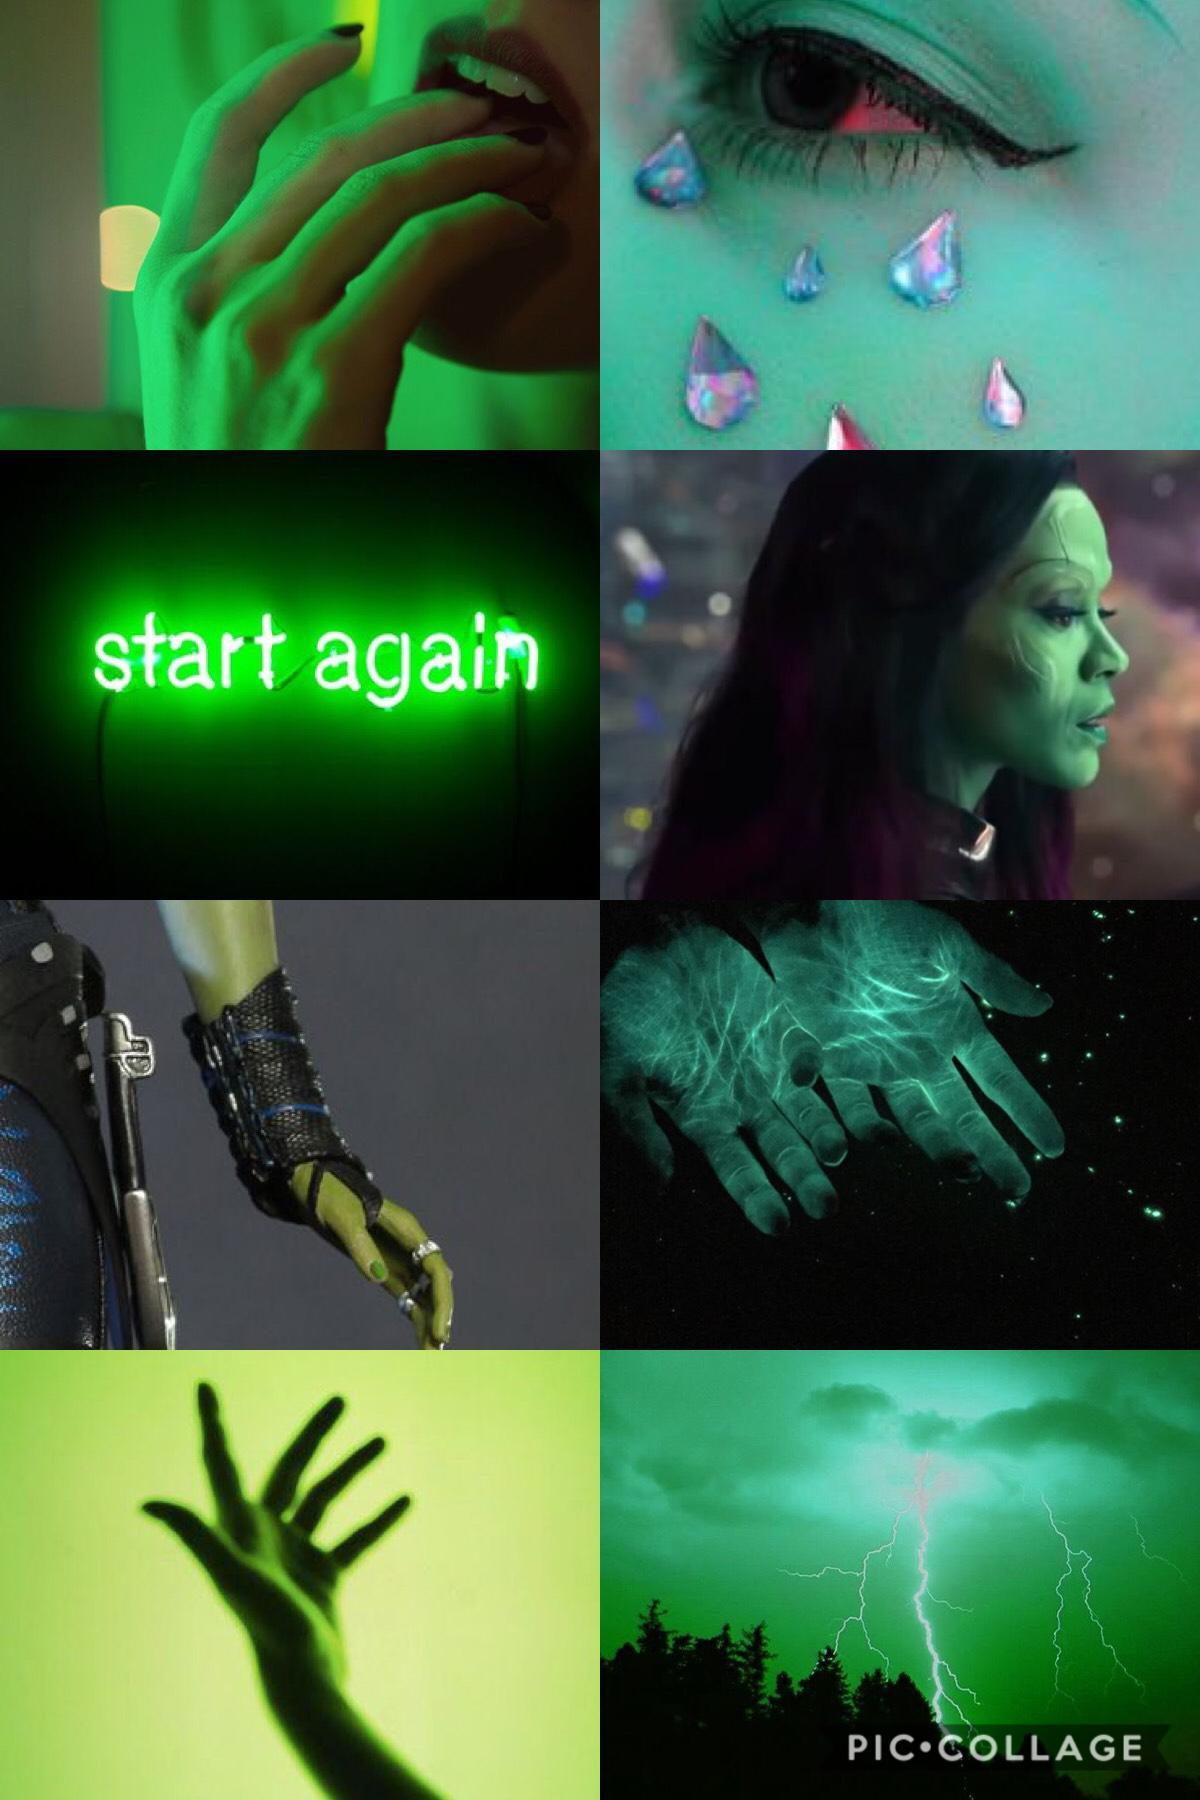 ✨Gamora!✨ Welp had to make this for my new username! Love Gamora! 💚